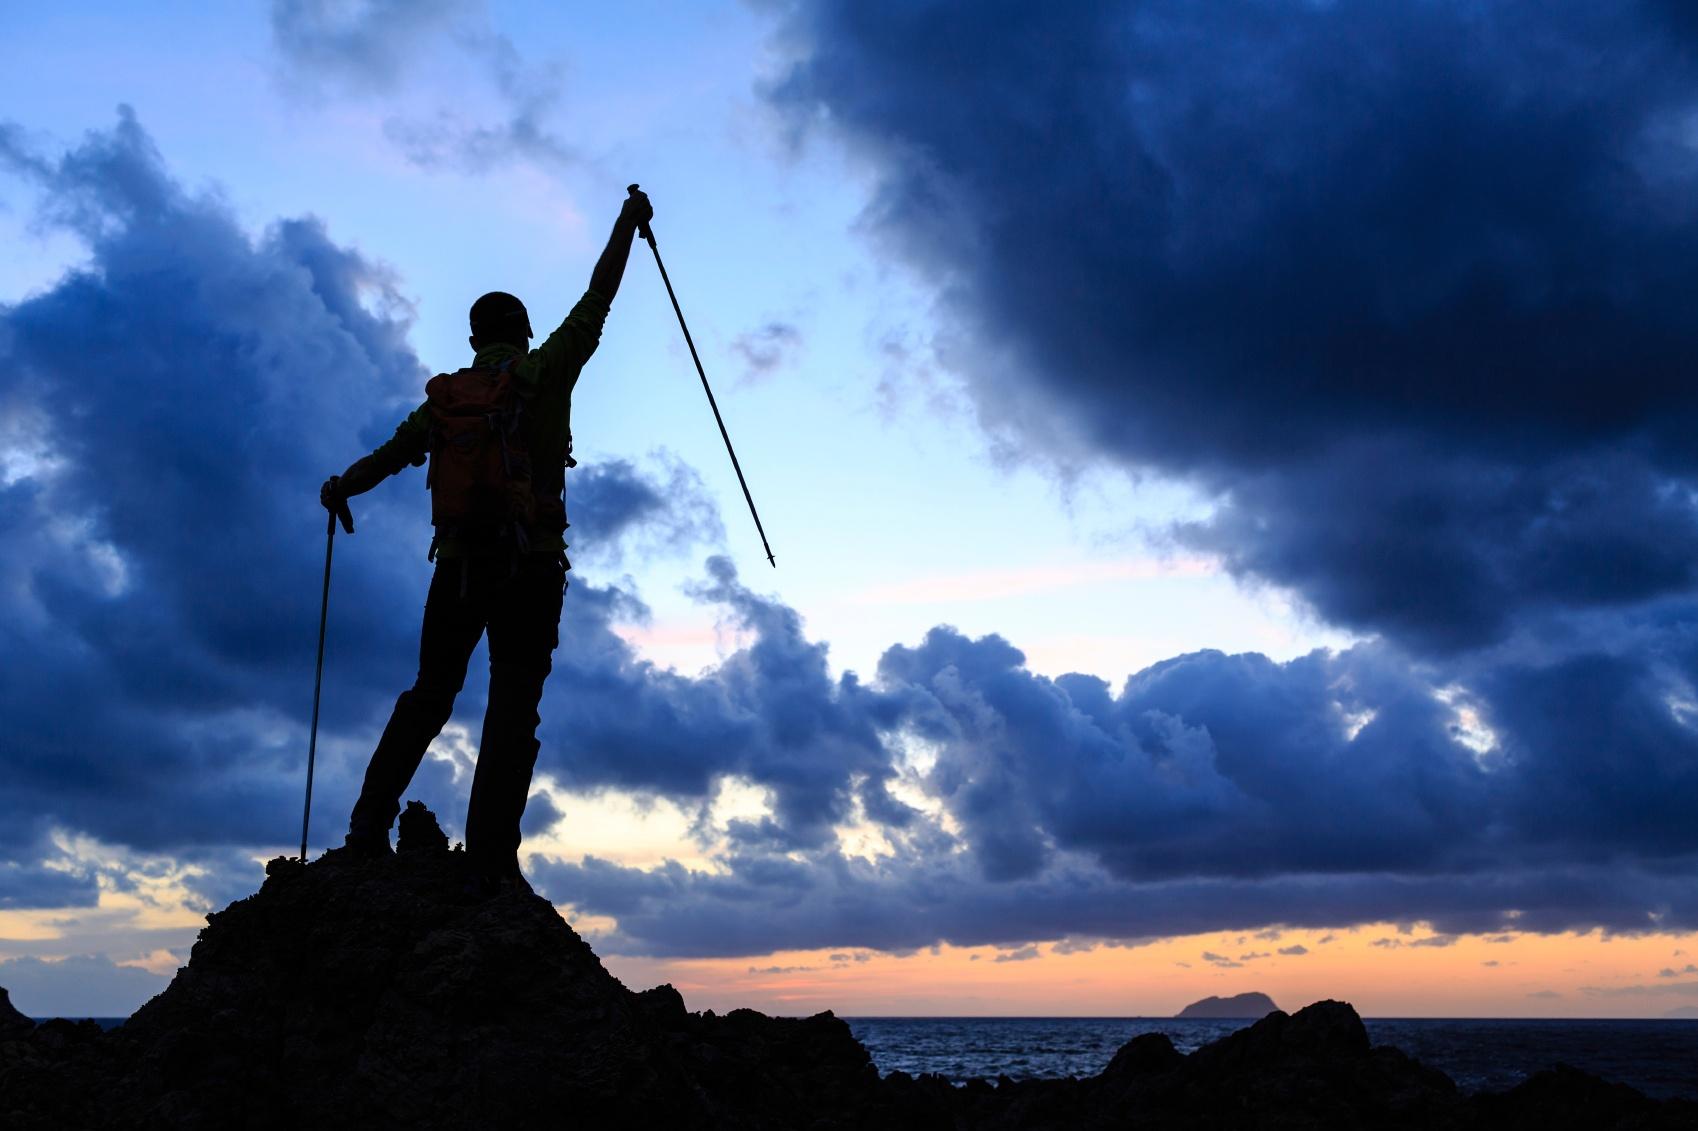 b2b_marketing_lead_gen_tips_to_reach_your_goals